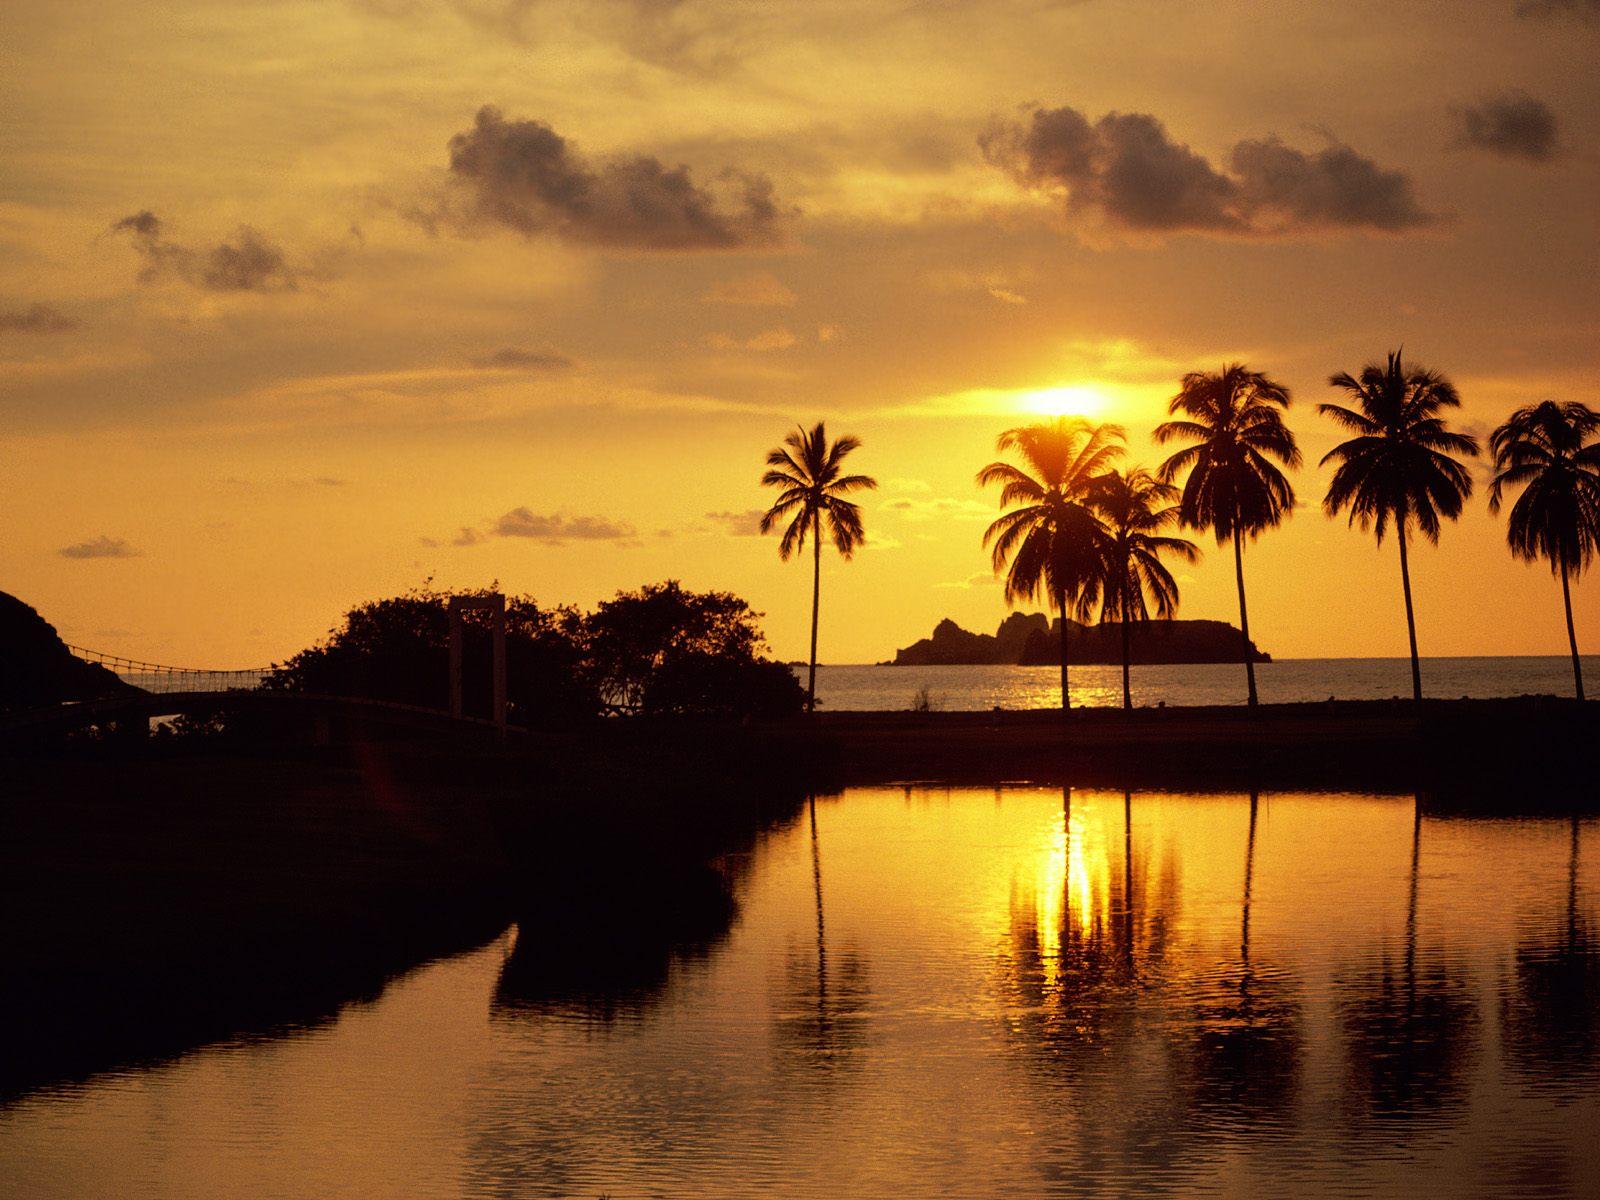 landscape wallpaper palm trees